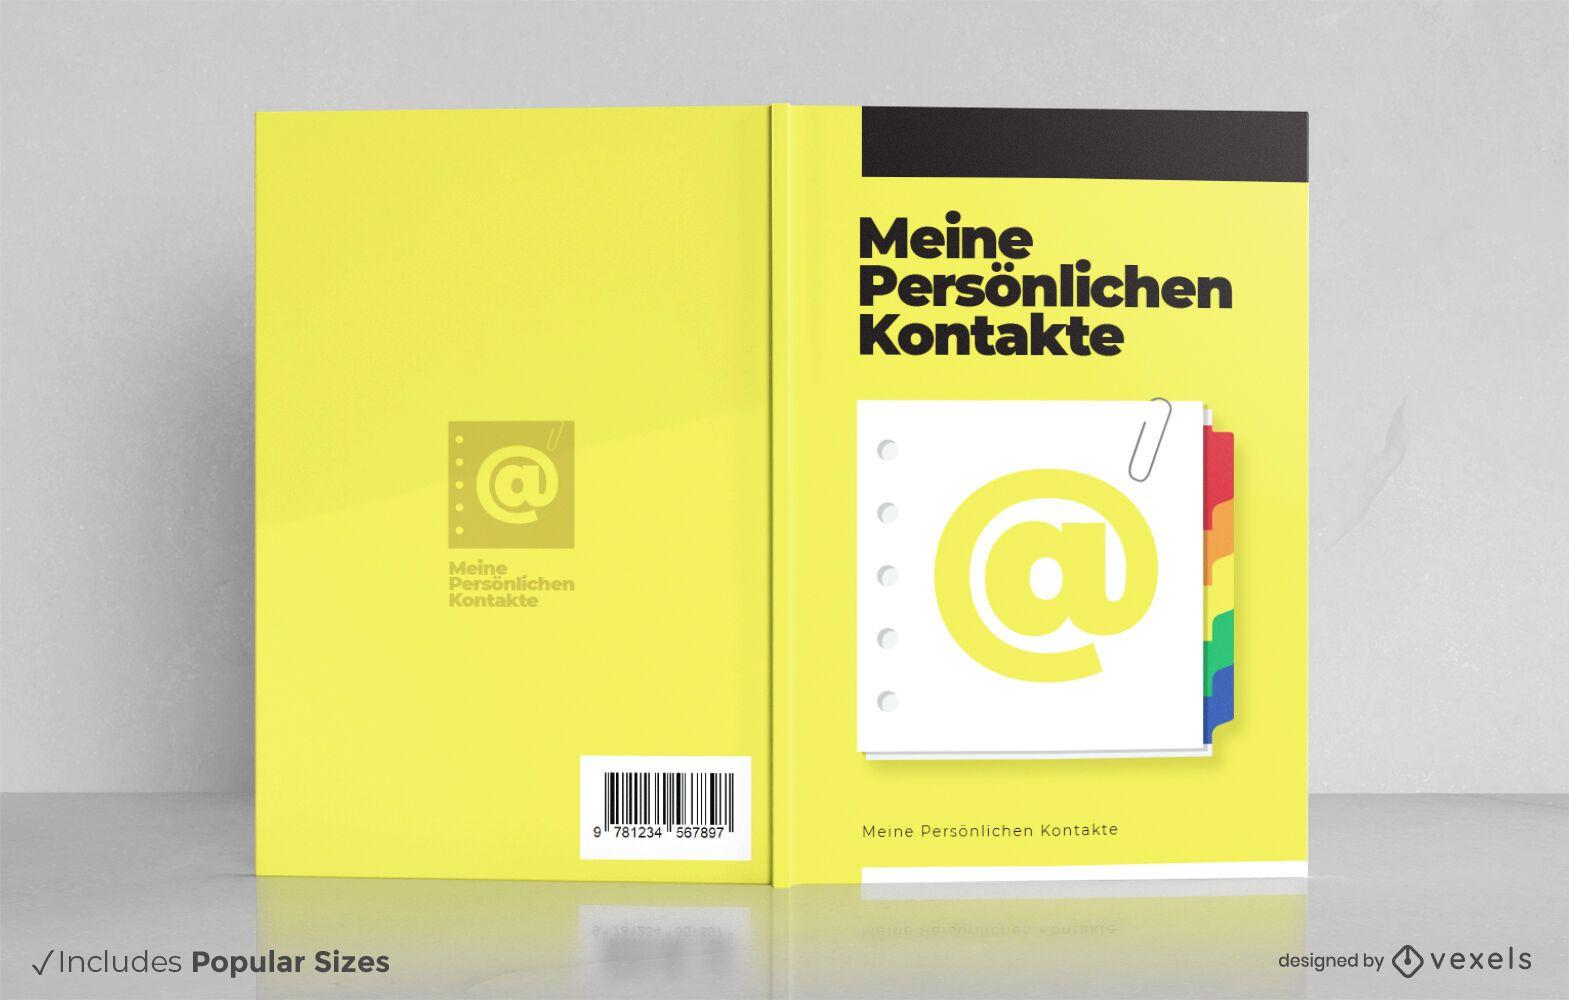 Telephone guide german book cover design